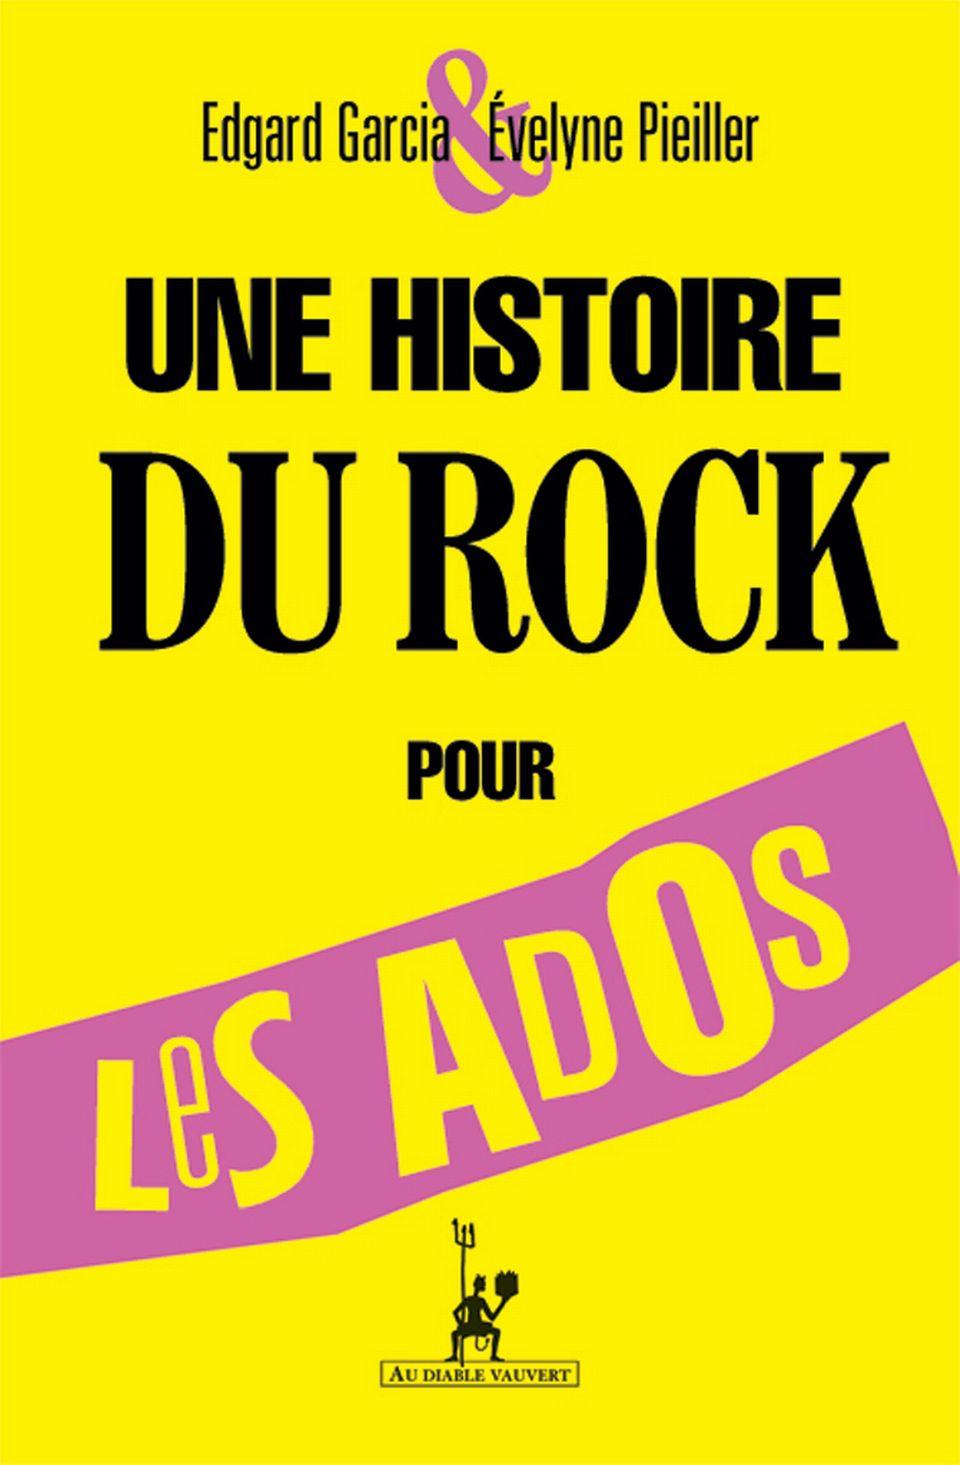 "Edgard Garcia - Evelyne Pieiller ""Une histoire du rock pour les ados "". [RTS]"